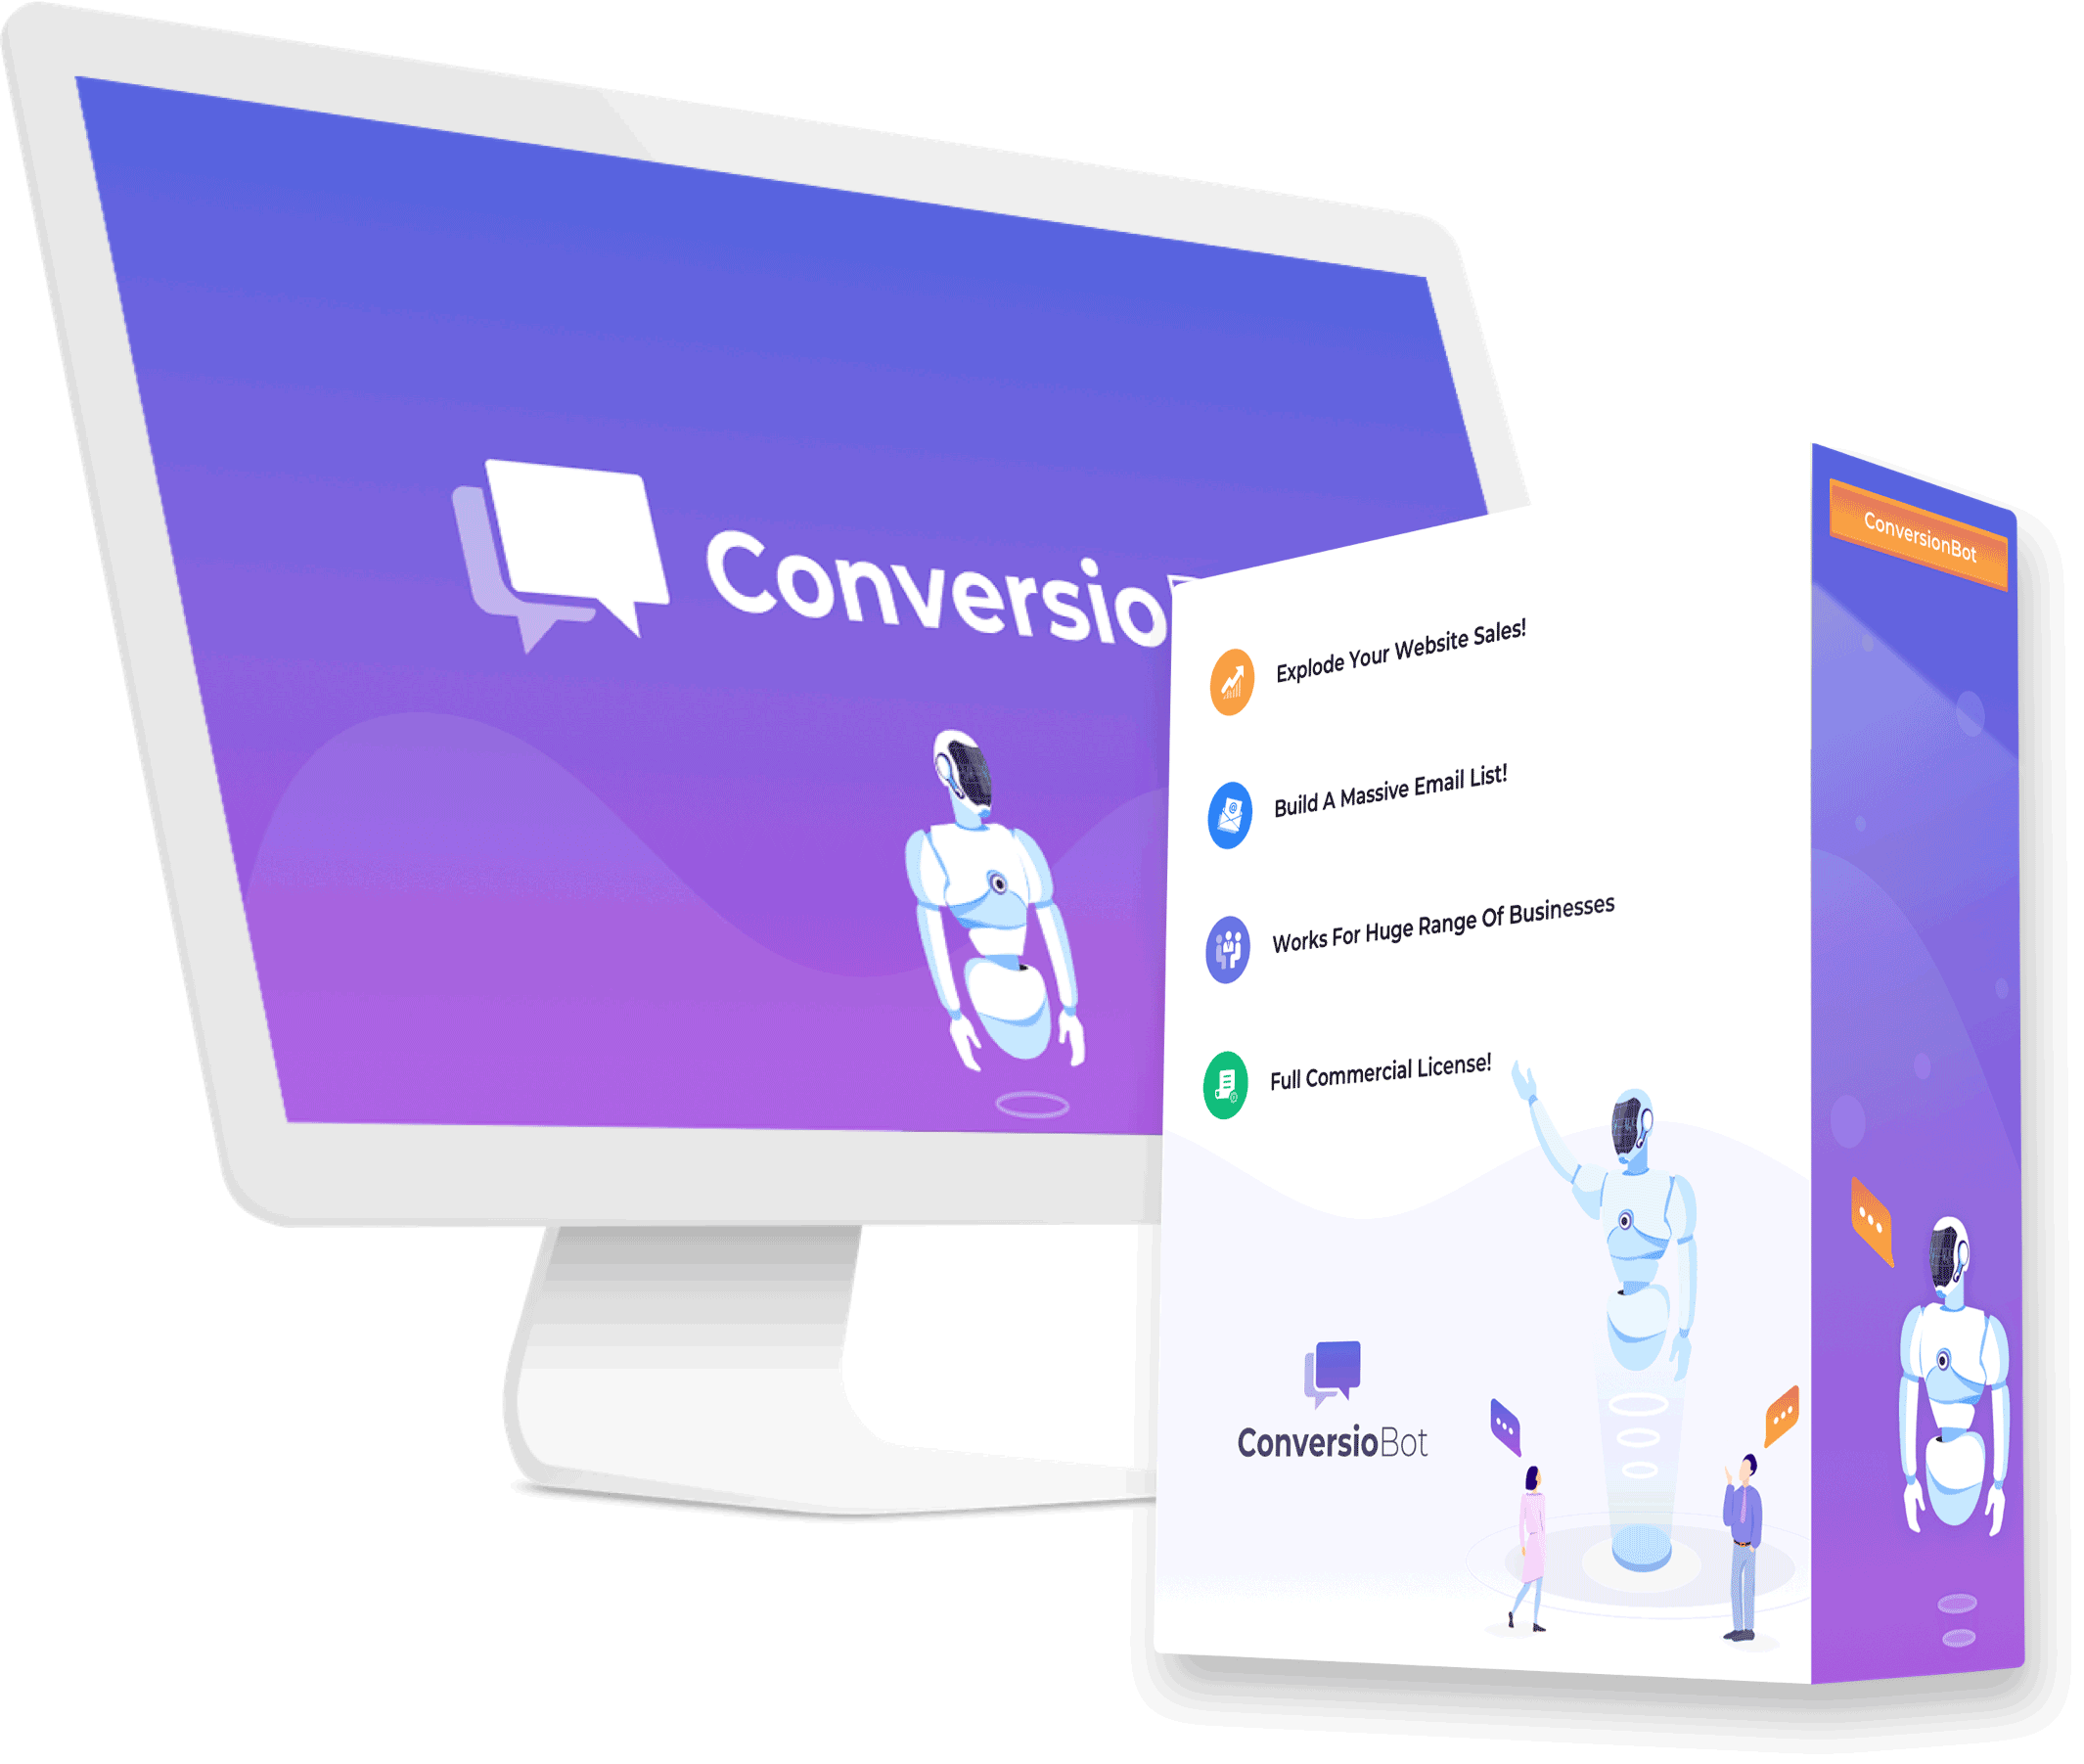 Conversiobot Product